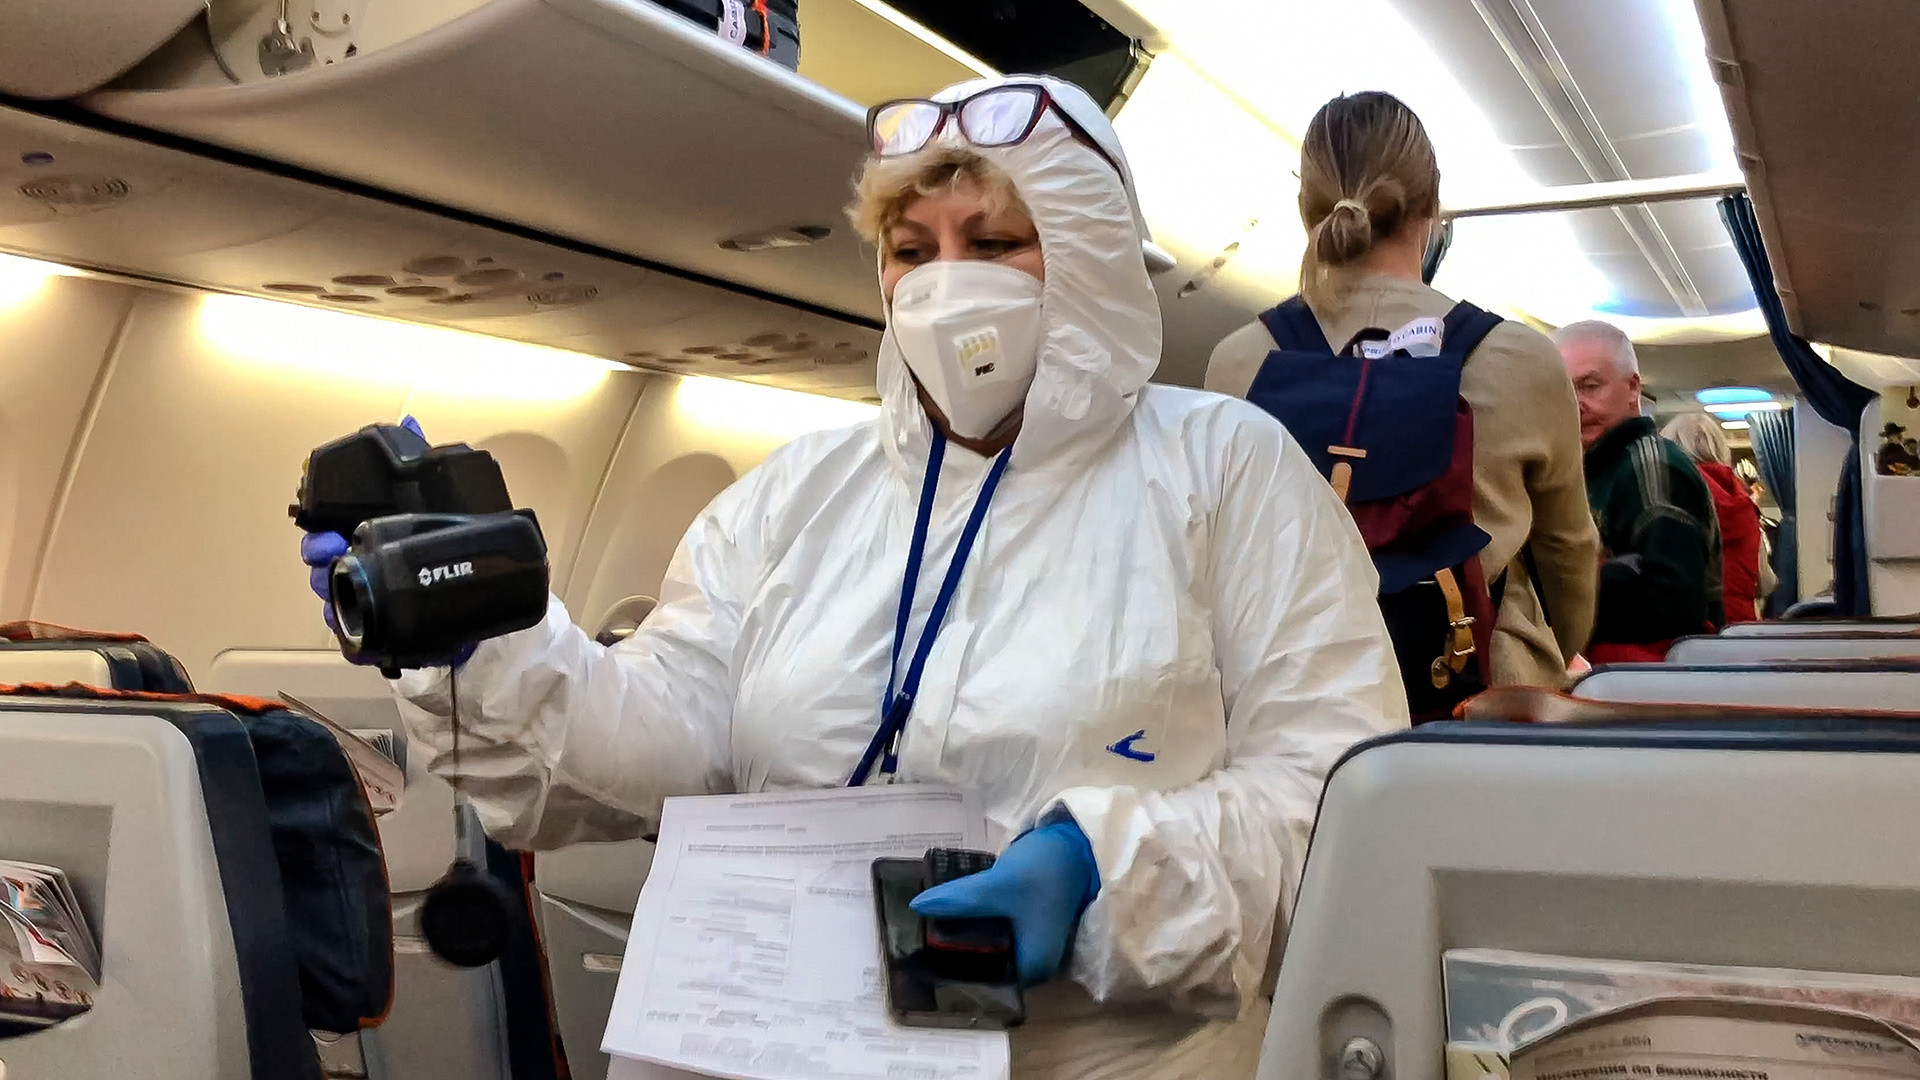 Seorang petuags medis memeriksa penumpang yang tiba dari Italia di dalam pesawat di Bandara Sheremetyevo, Moskow, 8 Maret 2020.